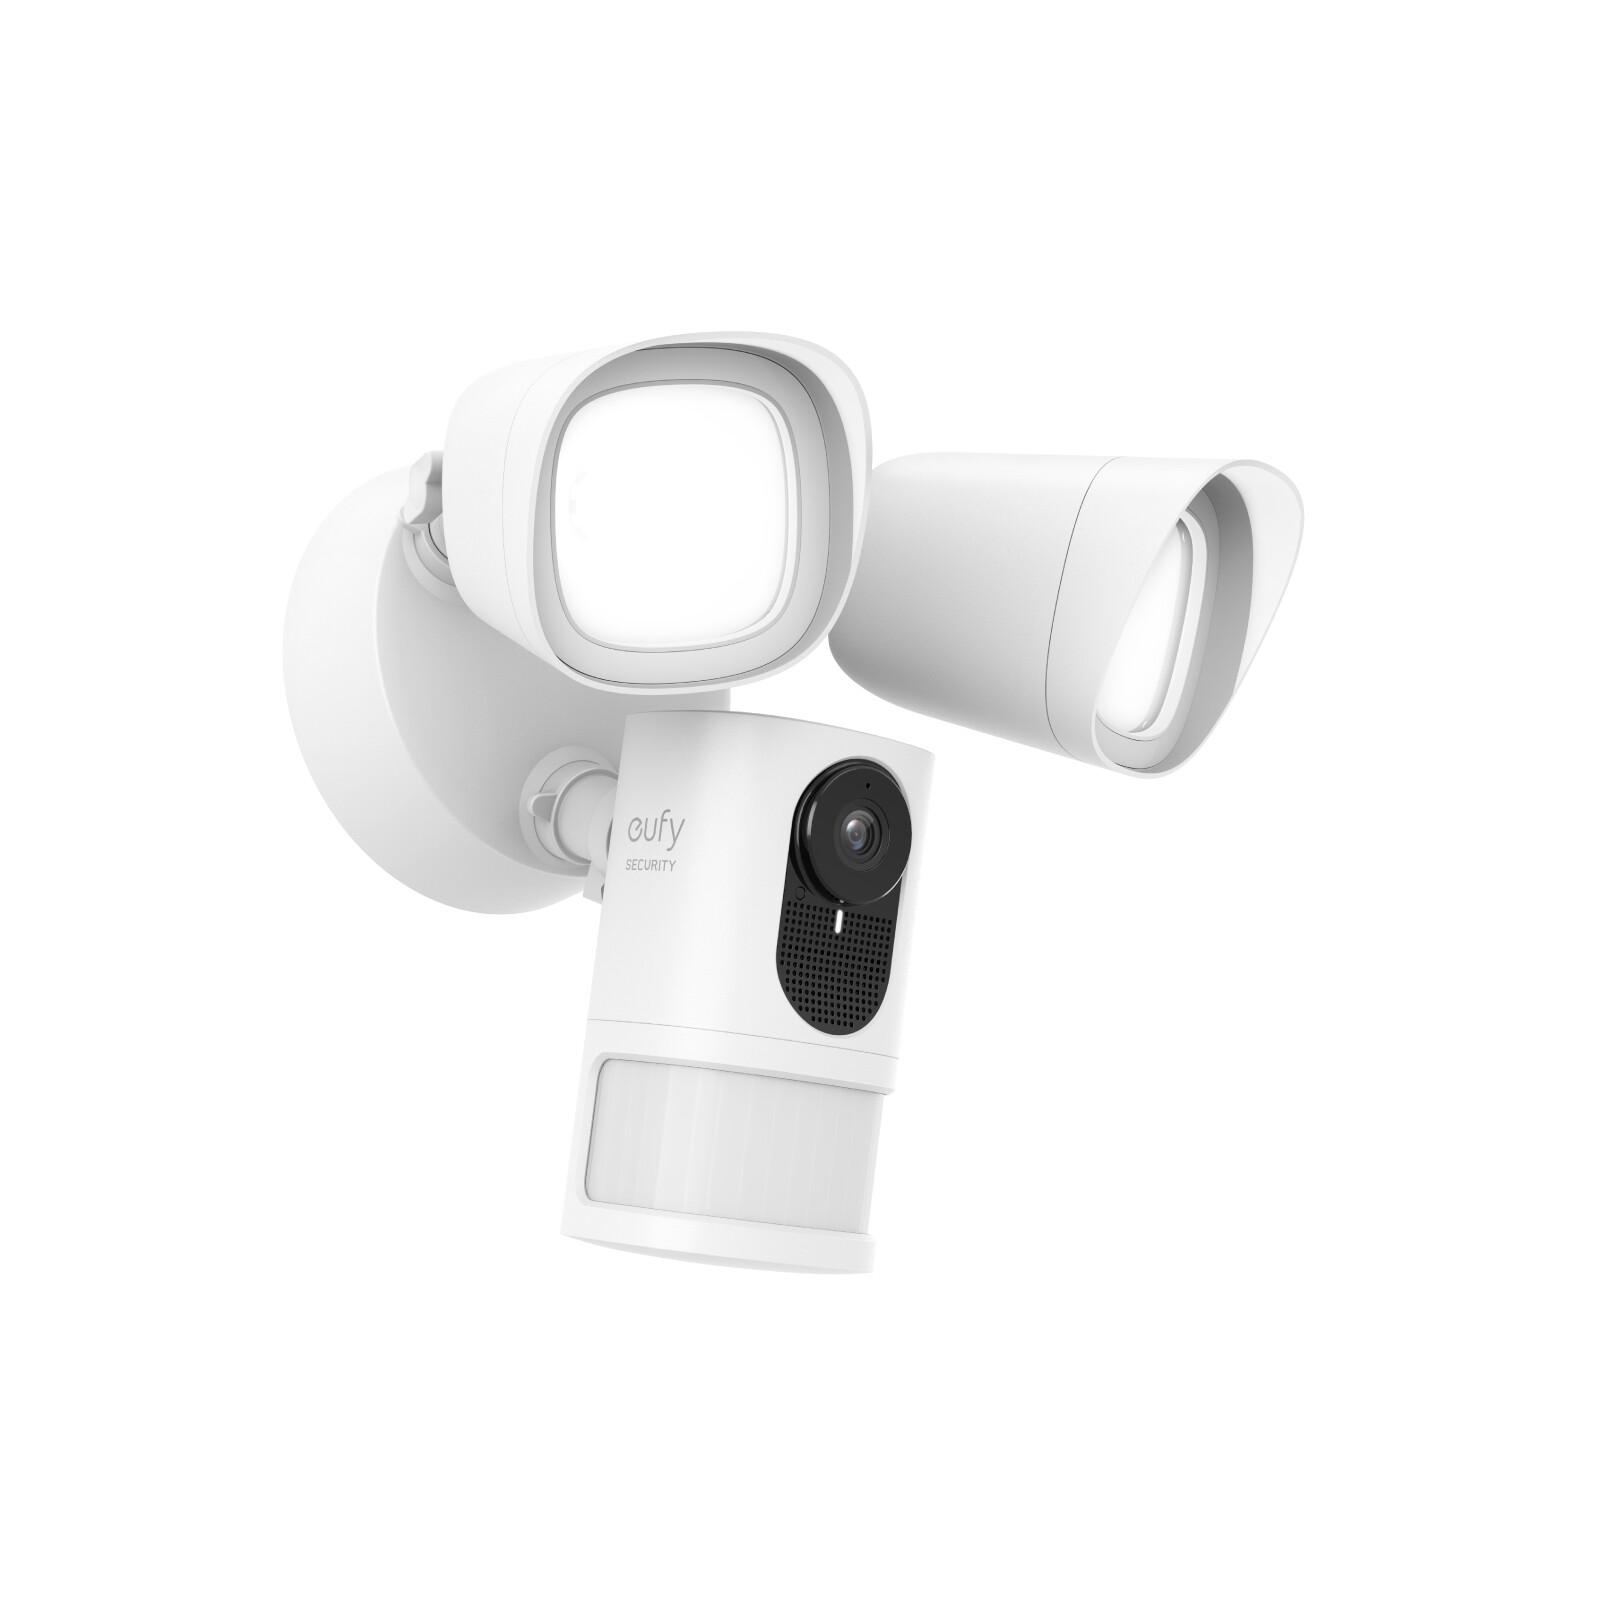 Eufy Floodlight Camera white